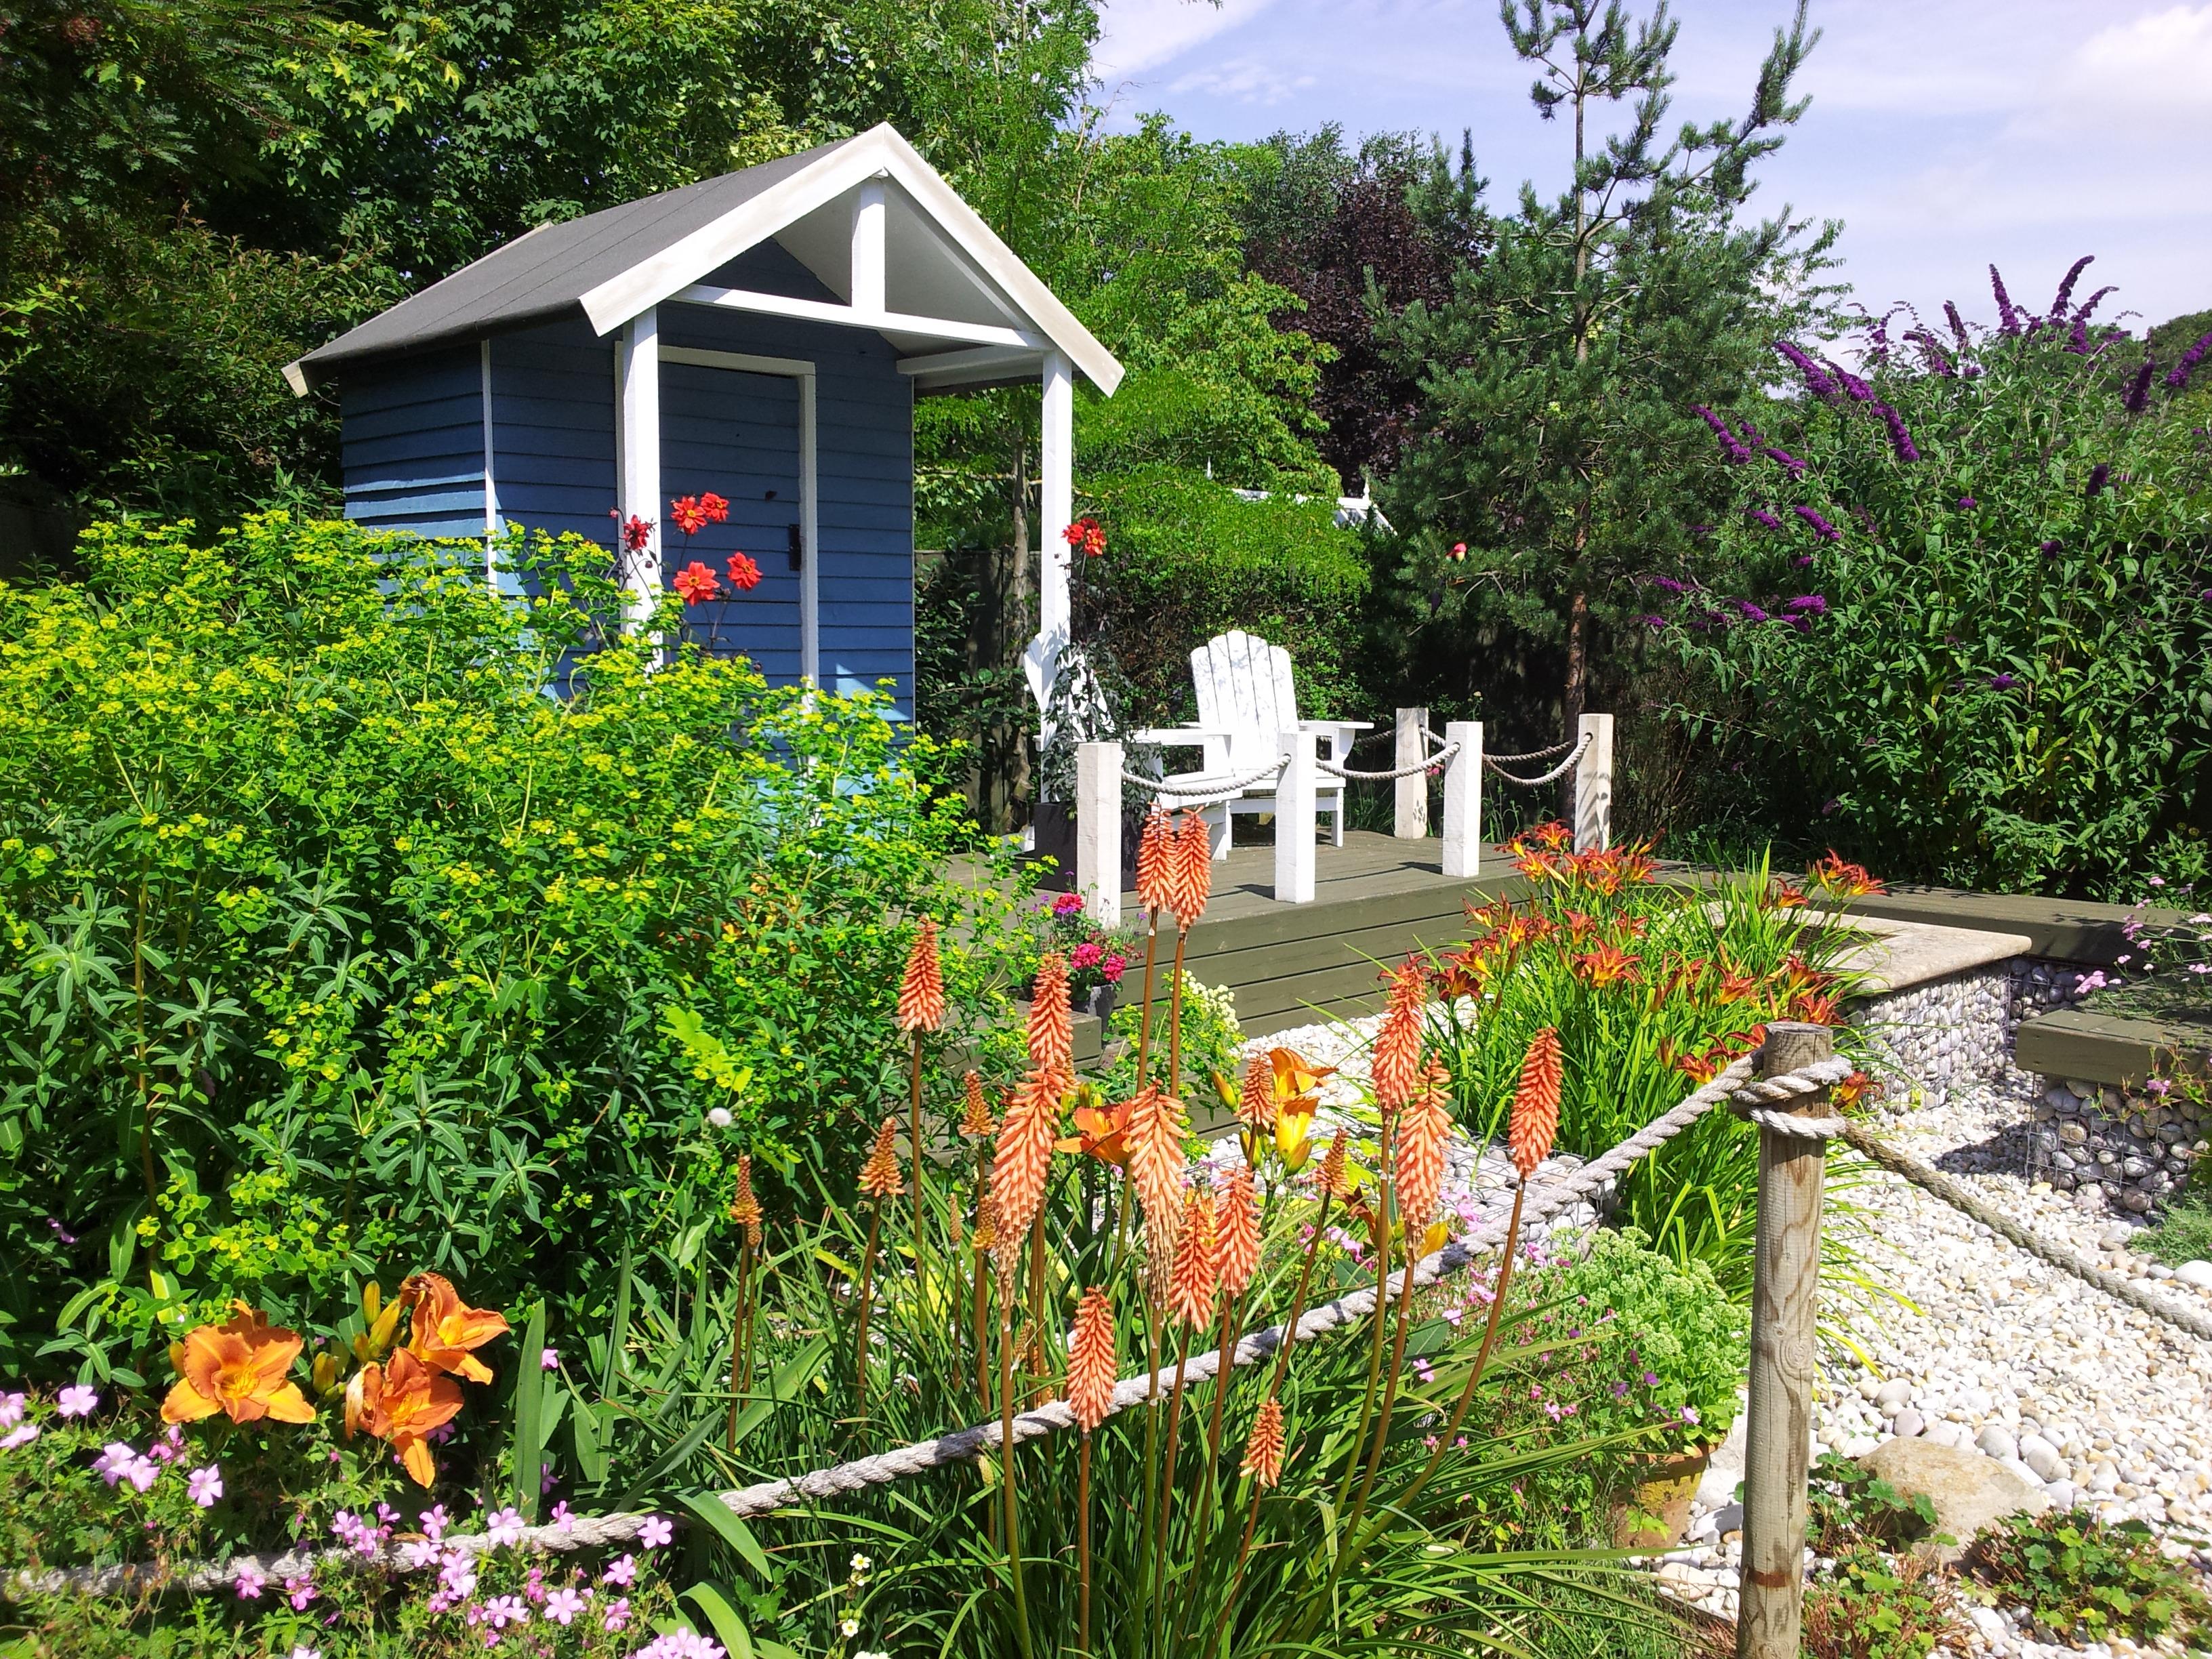 The Land's End Garden, designed as a seaside retreat.